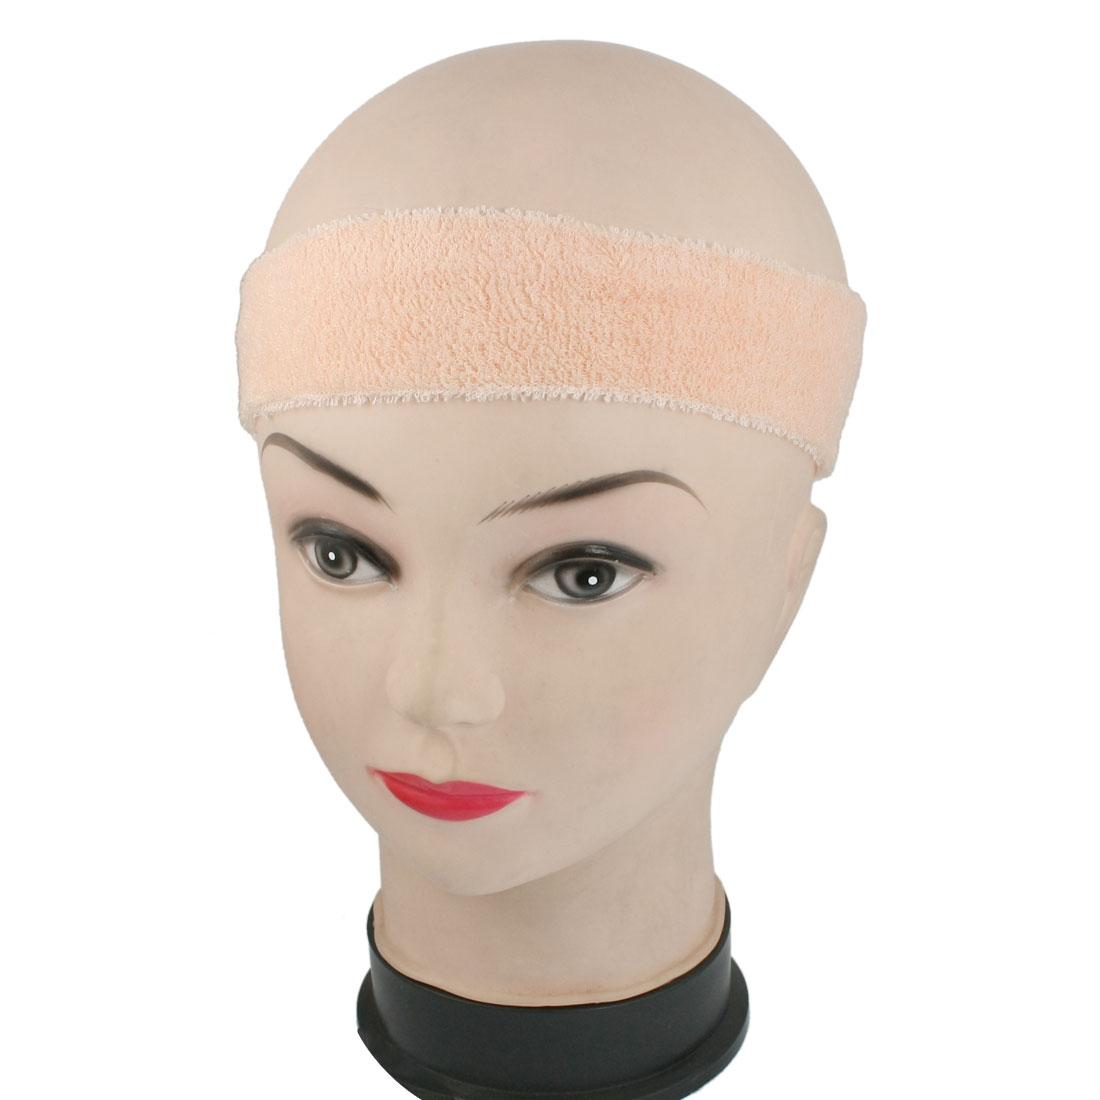 Bathroom Spa Face Washing Elastic Headband Hair Band Pale Apricot